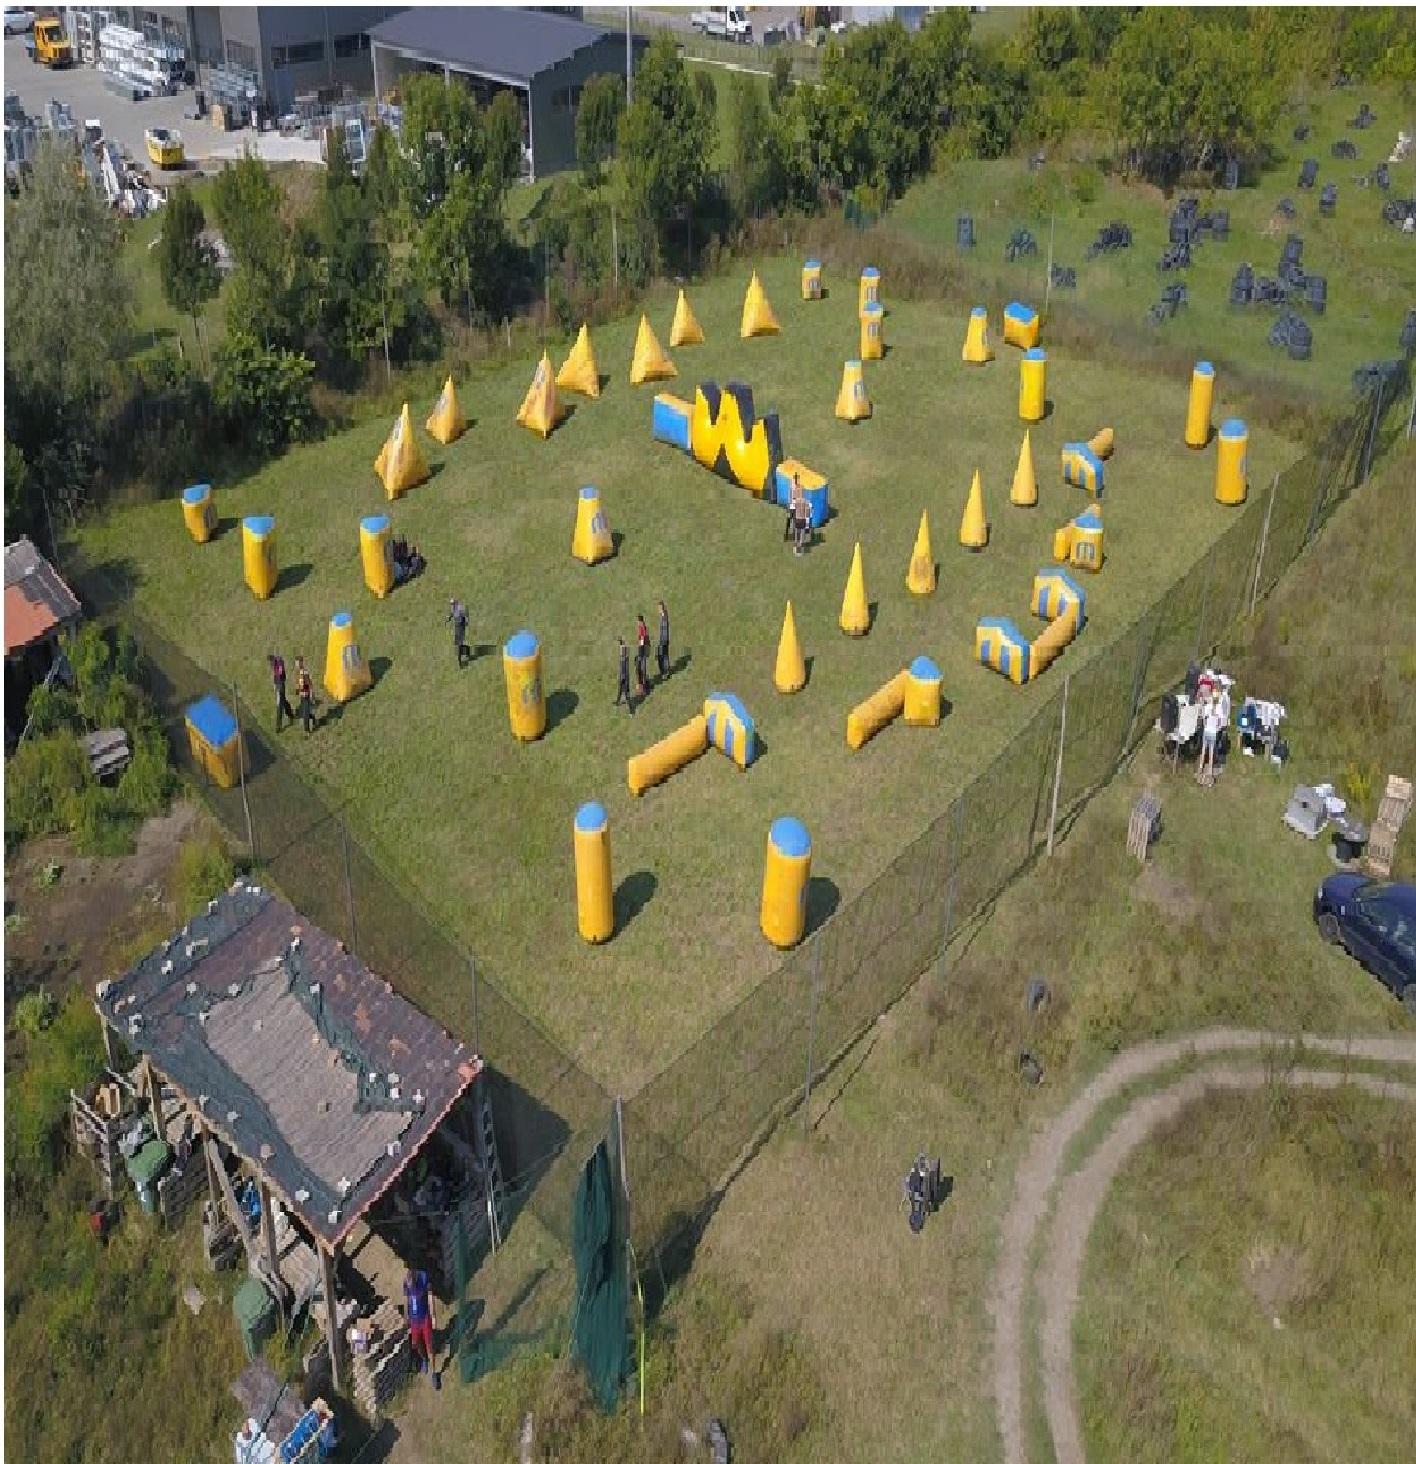 paintball verseny, paintball pálya, paintball pálya Budapest